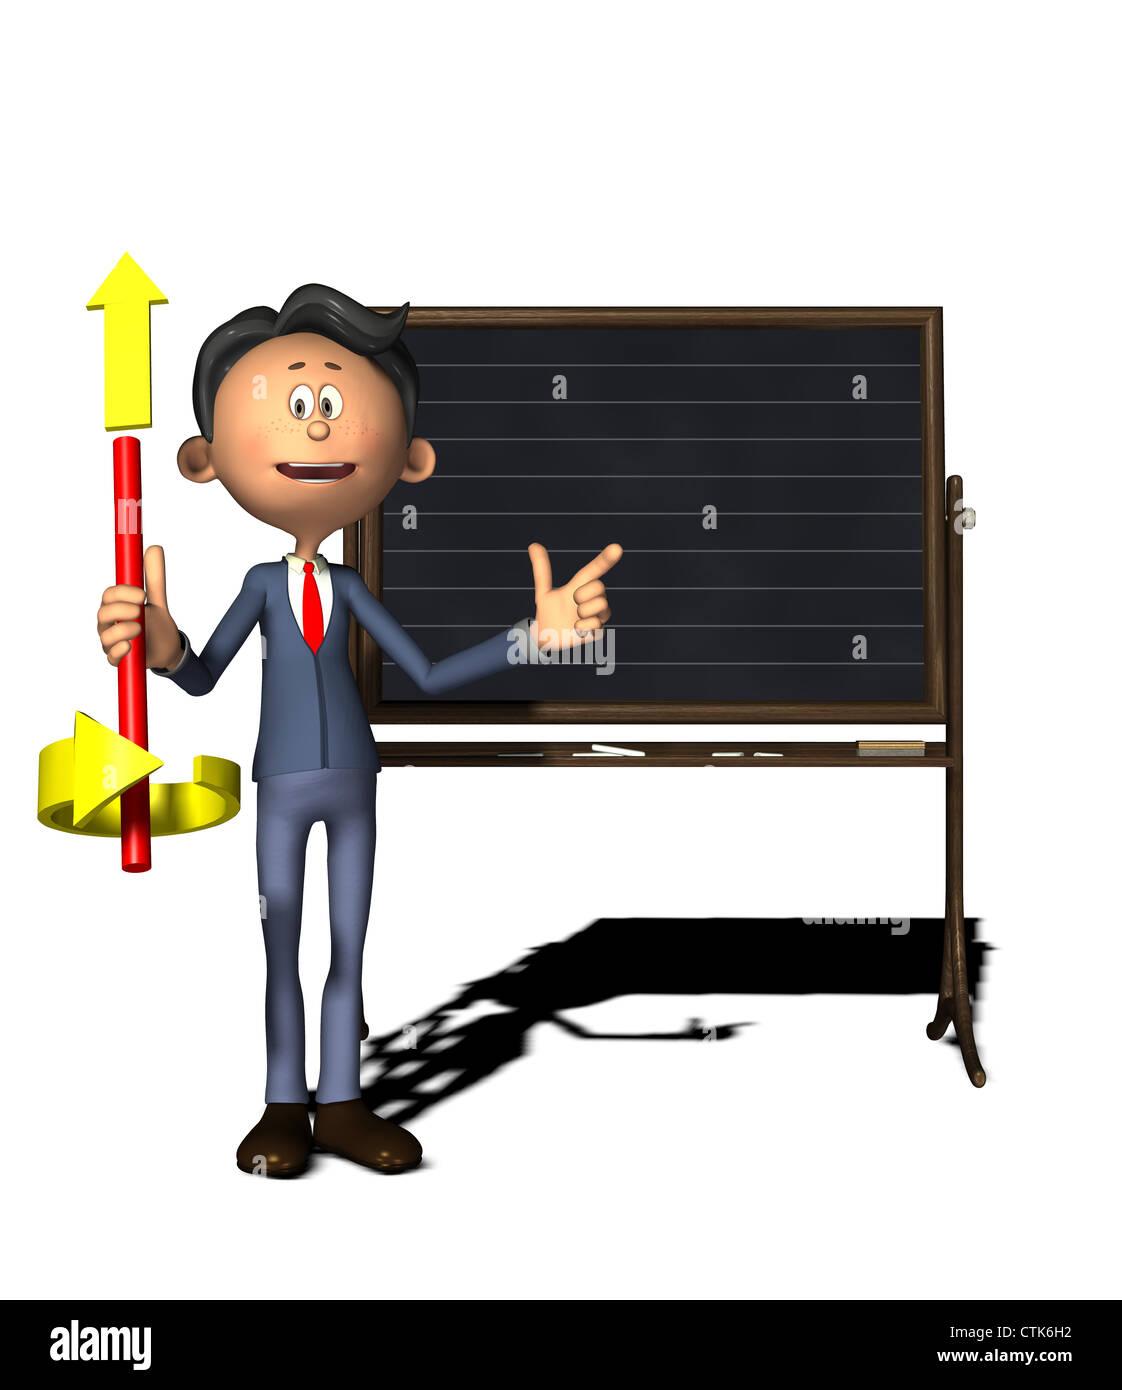 cartoon figure physics teacher shows the right-hand thumb rule - Stock Image